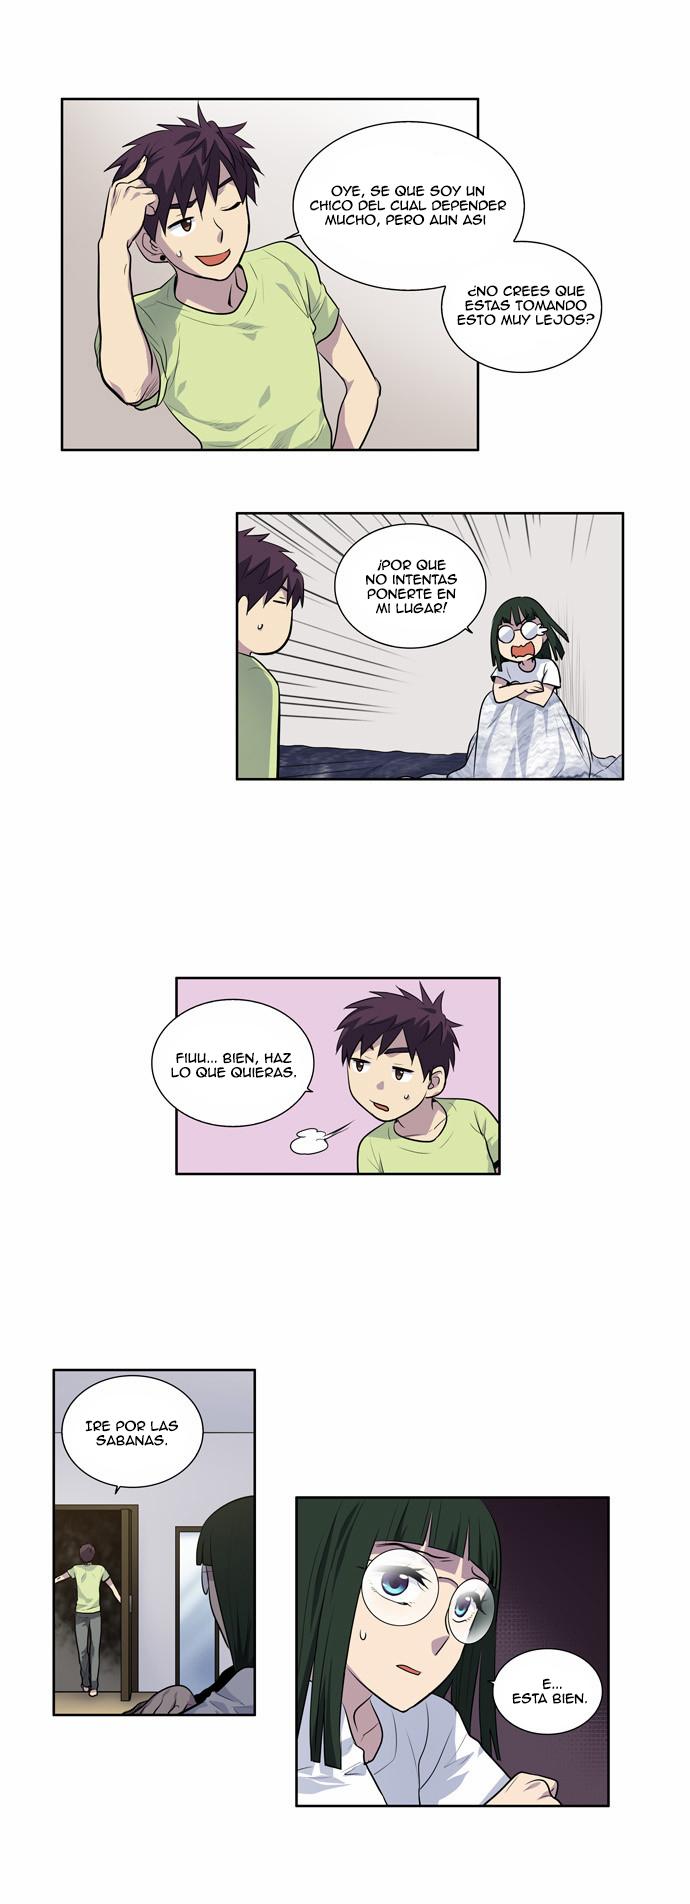 http://c5.ninemanga.com/es_manga/61/1725/453062/9f5c2f346de52c77f162838fdda18c06.jpg Page 3